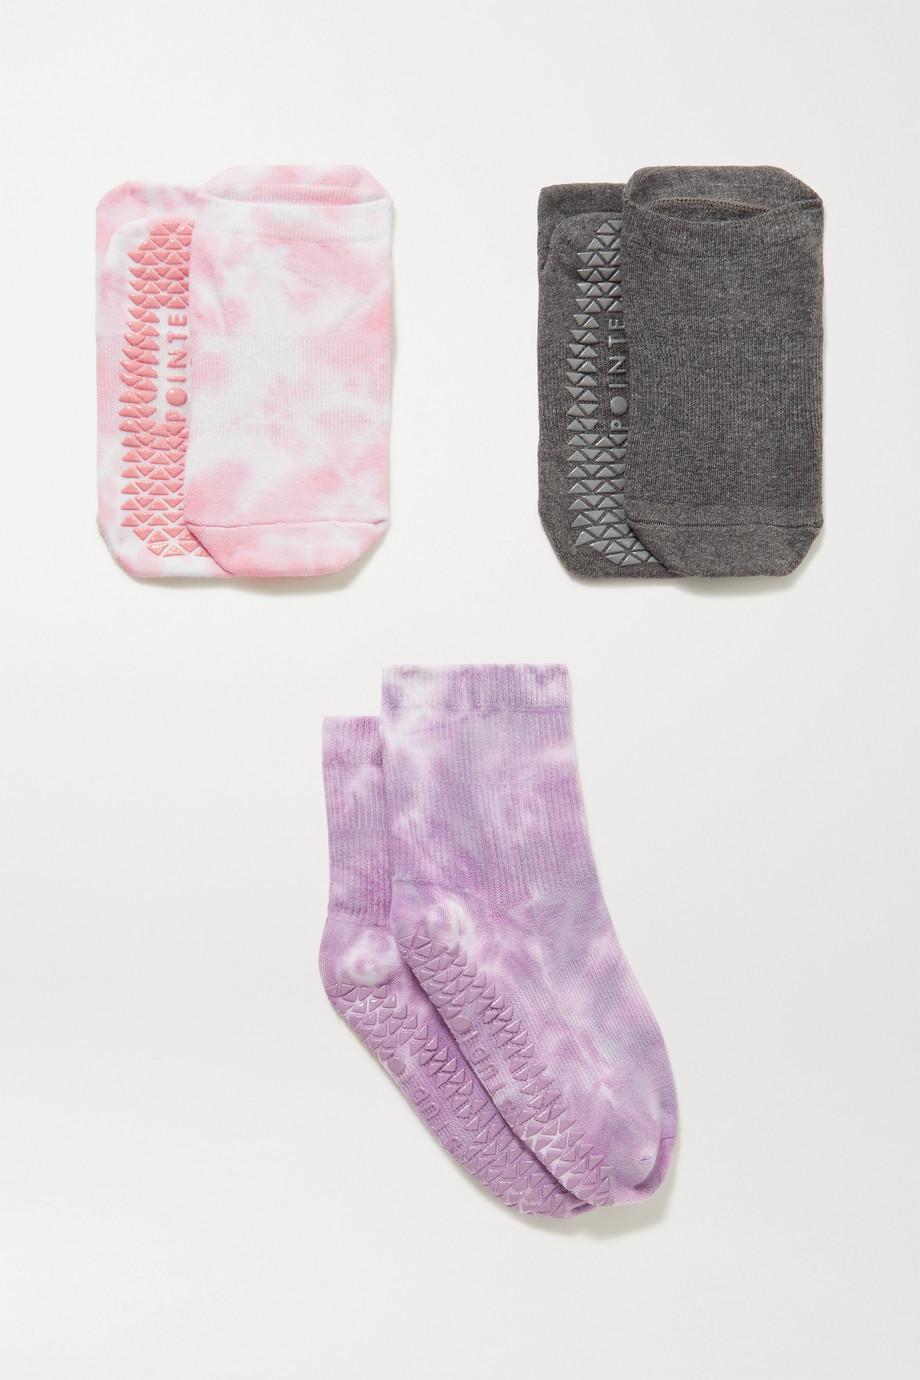 POINTE STUDIO Fashion Studio set of three cotton-blend socks